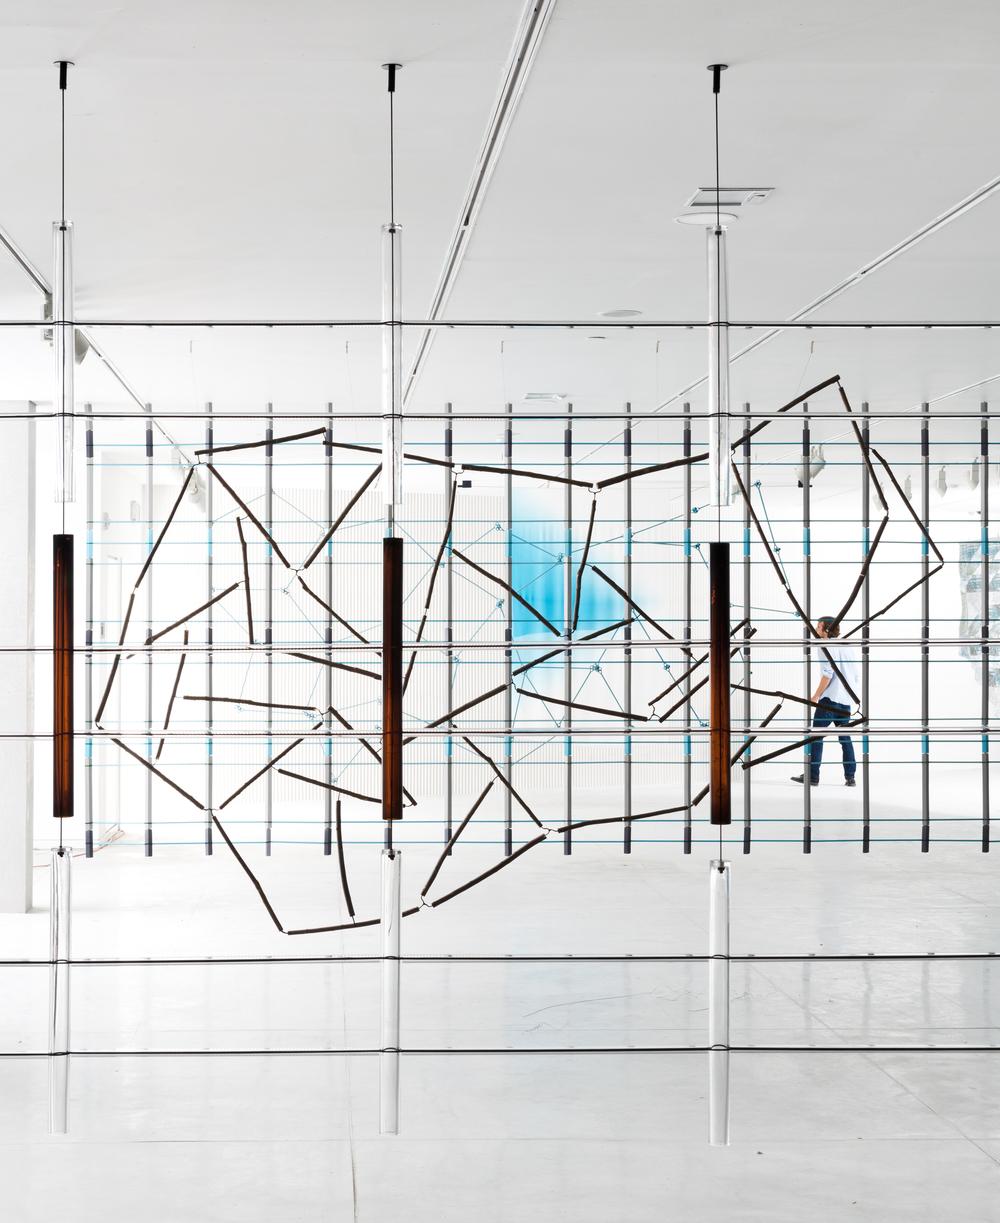 17 Screens Ronan and Erwan Bouorullec / London Design Journal